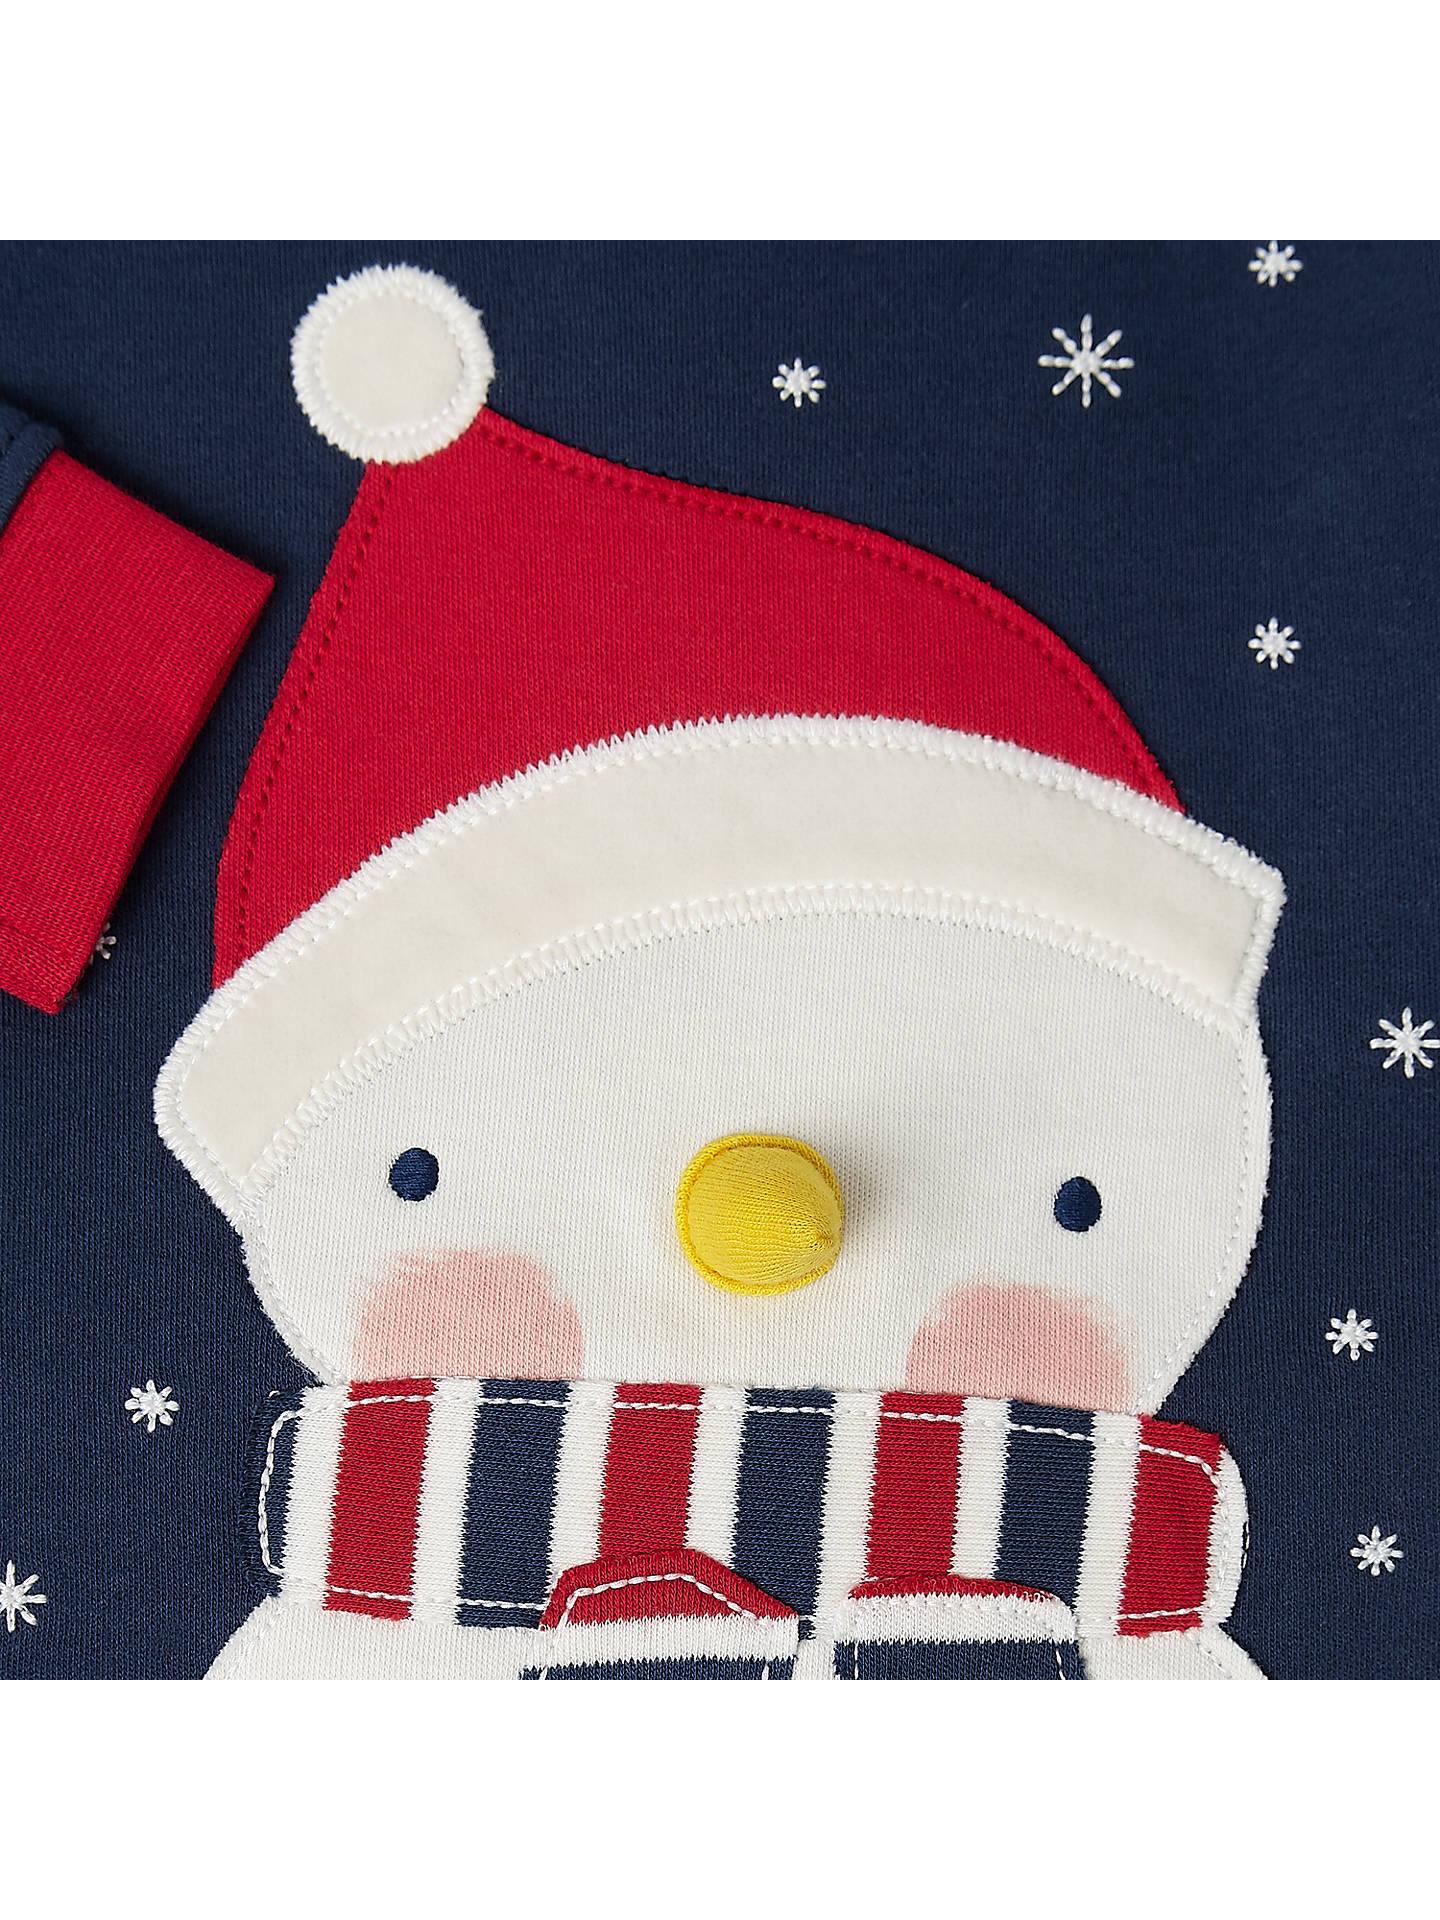 1eda2f690e894 ... Buy John Lewis Baby Christmas Snowman Pyjamas